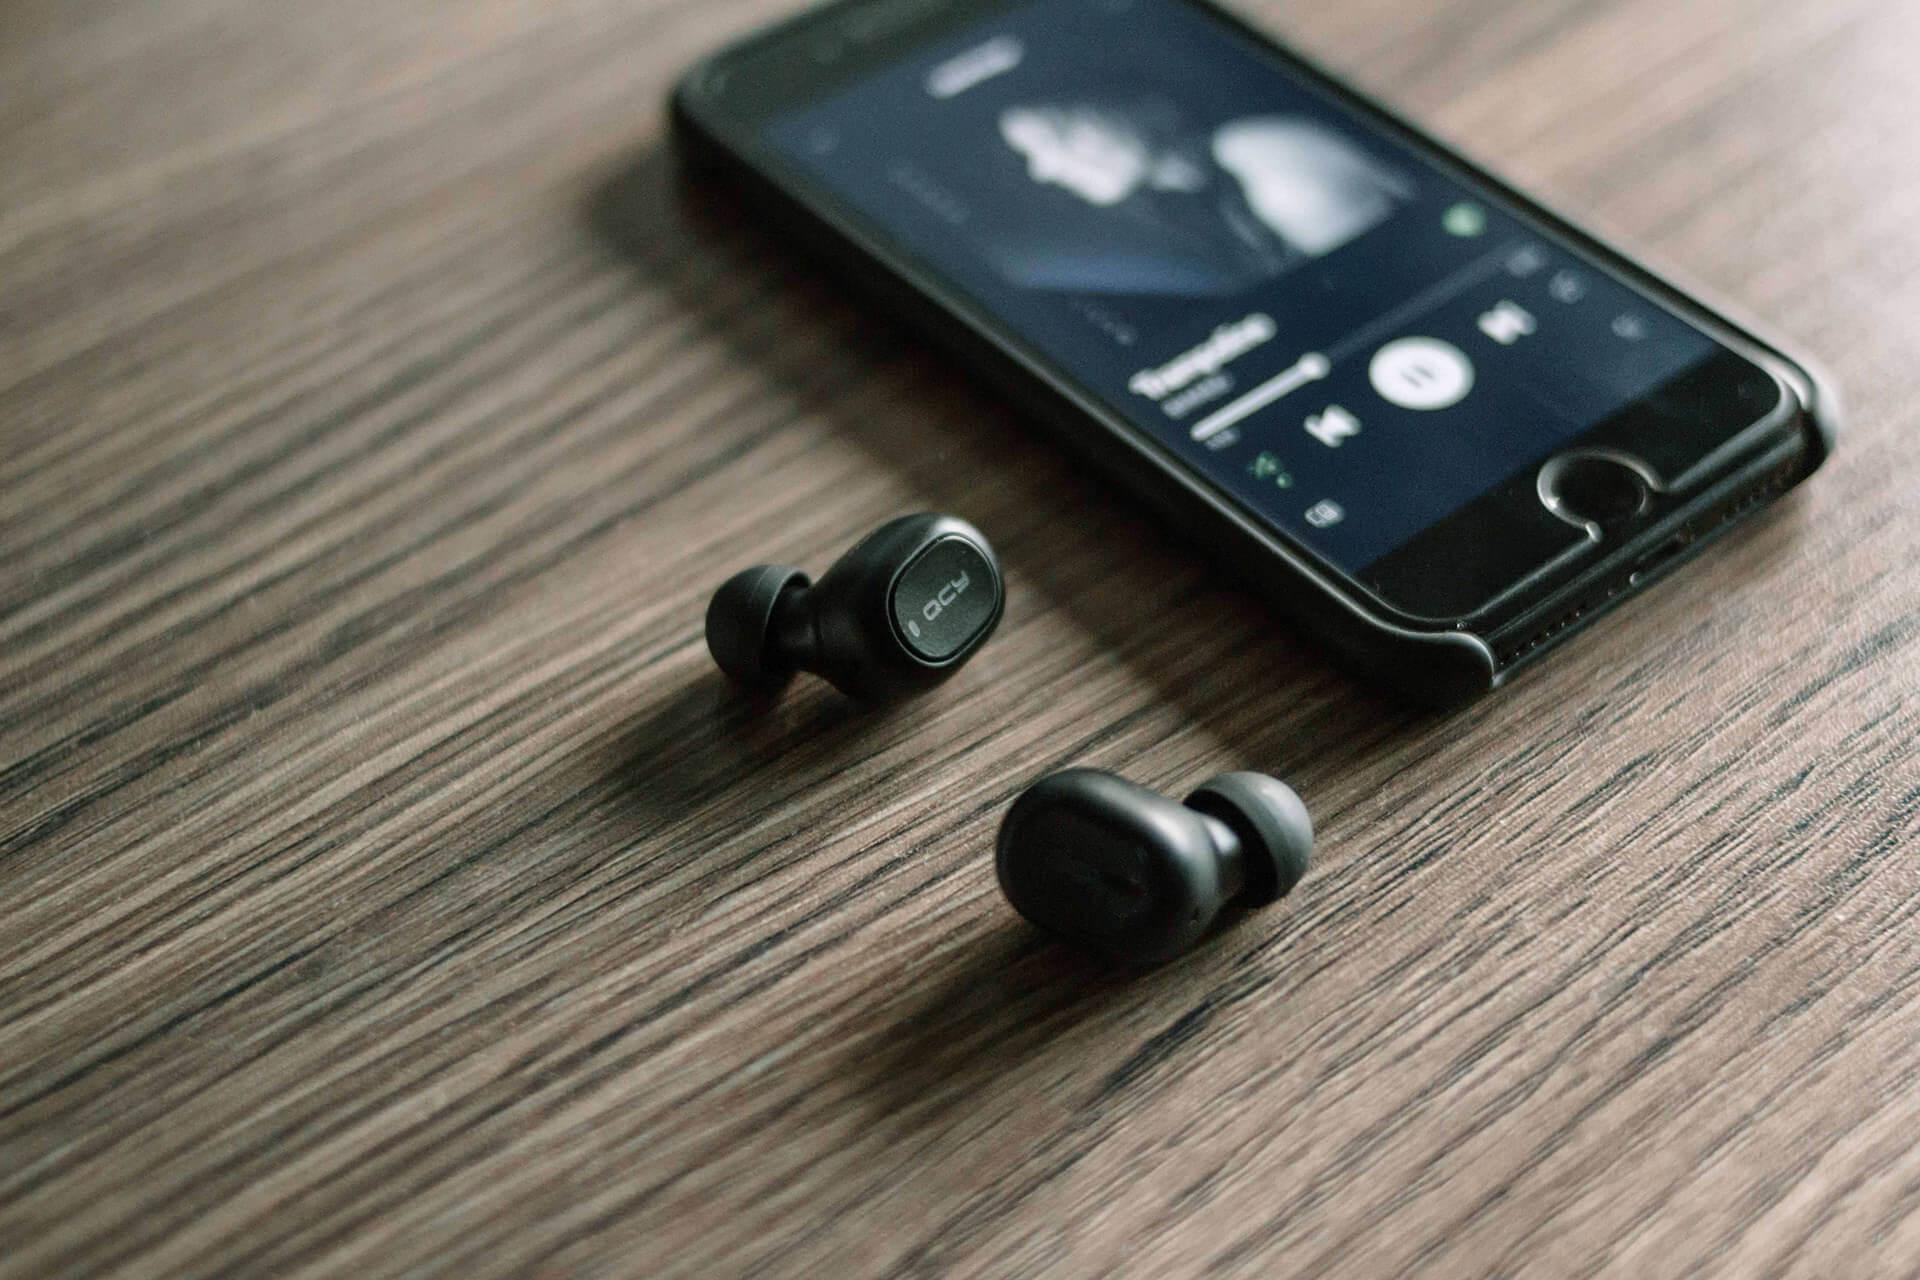 Bluetooth Phone and Headphones